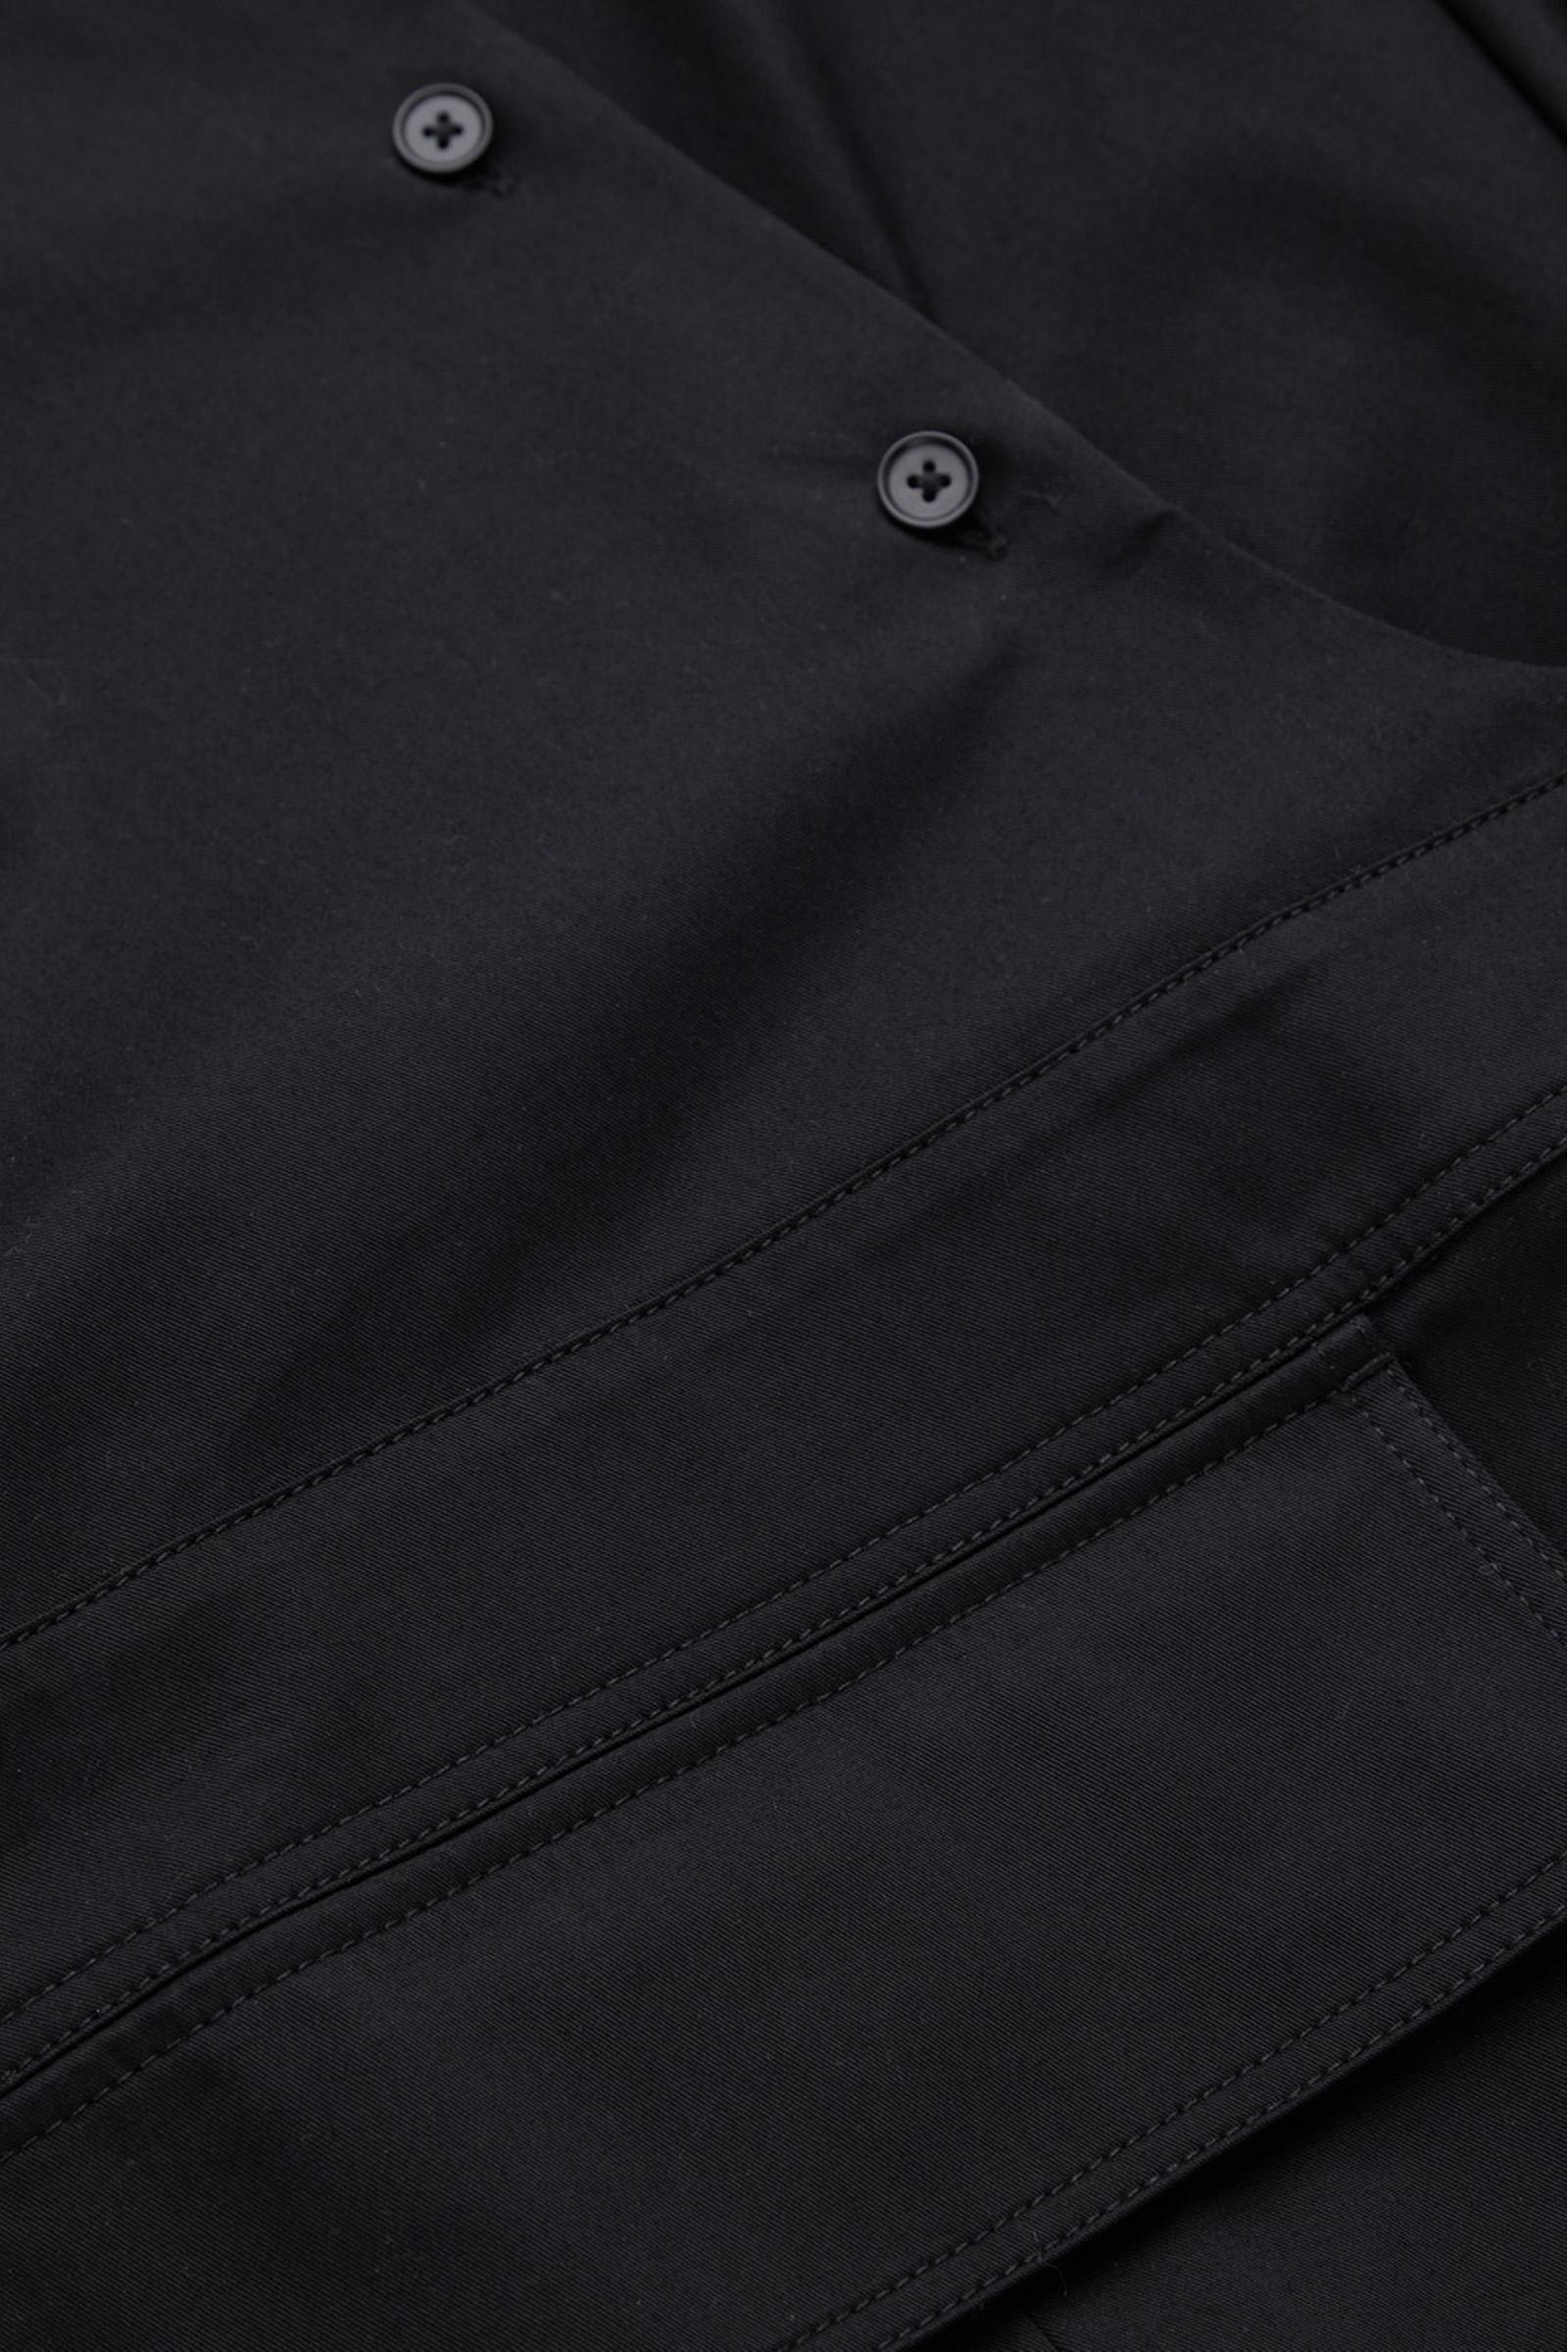 COS 벨티드 셔츠 드레스의 블랙컬러 Detail입니다.